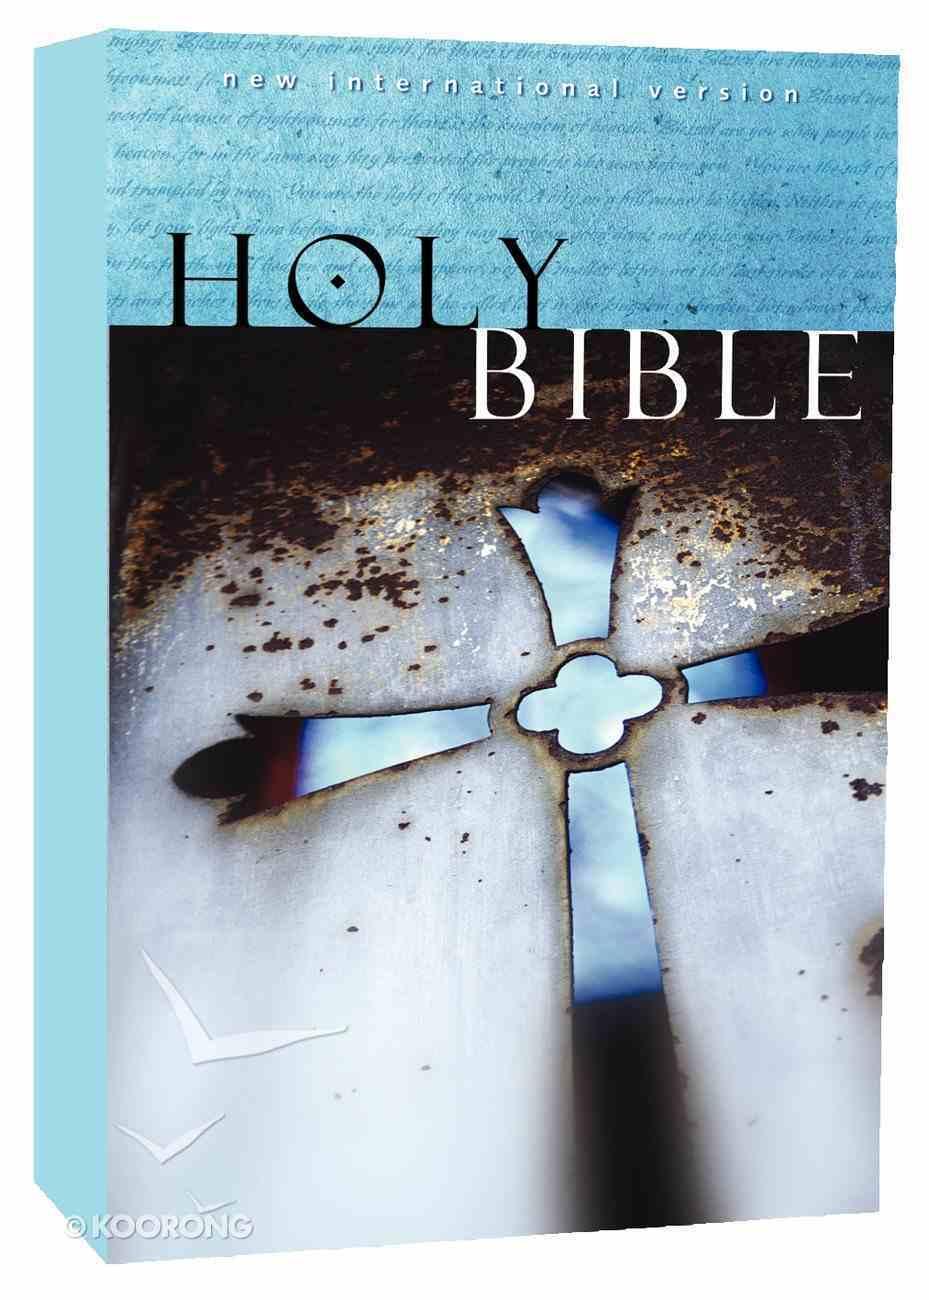 NIV Holy Bible Witness Edition Blue Cross (Black Letter Edition) Paperback